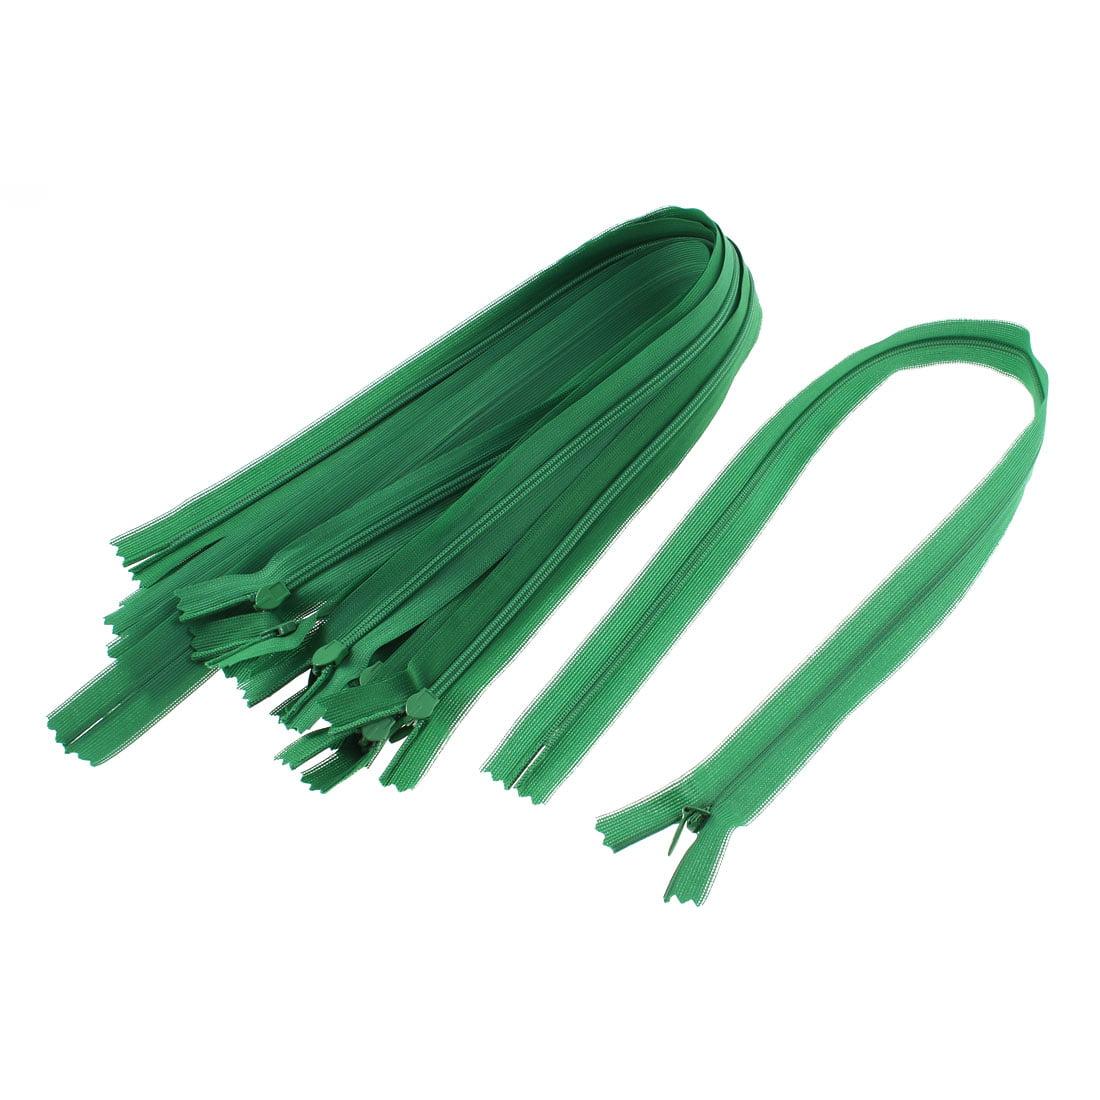 Unique Bargains Dress Pants Closed End Nylon Zippers Tailor Sewing Craft Tool Green 50cm 10 Pcs